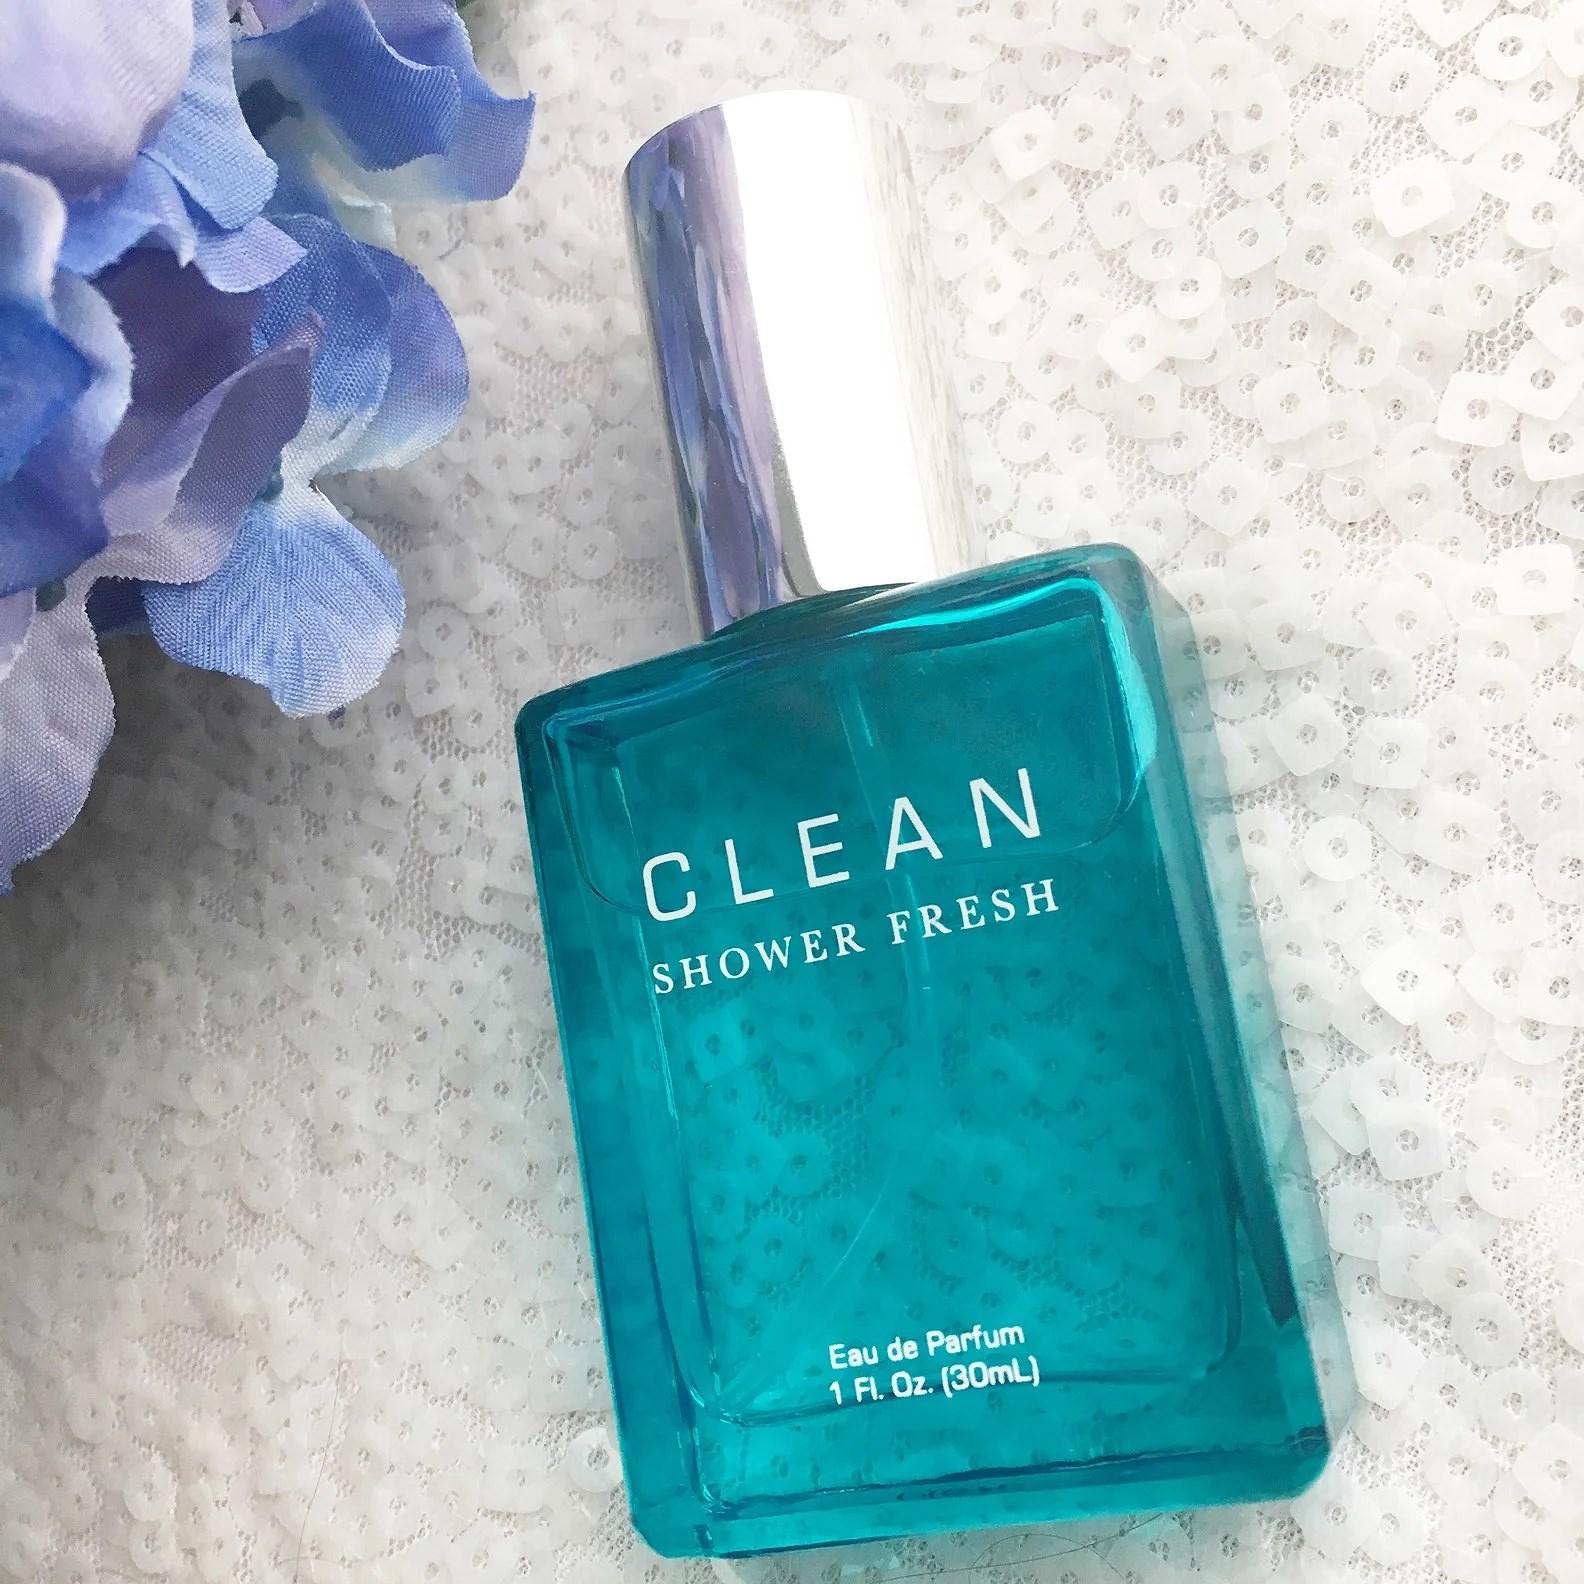 Shower fresh